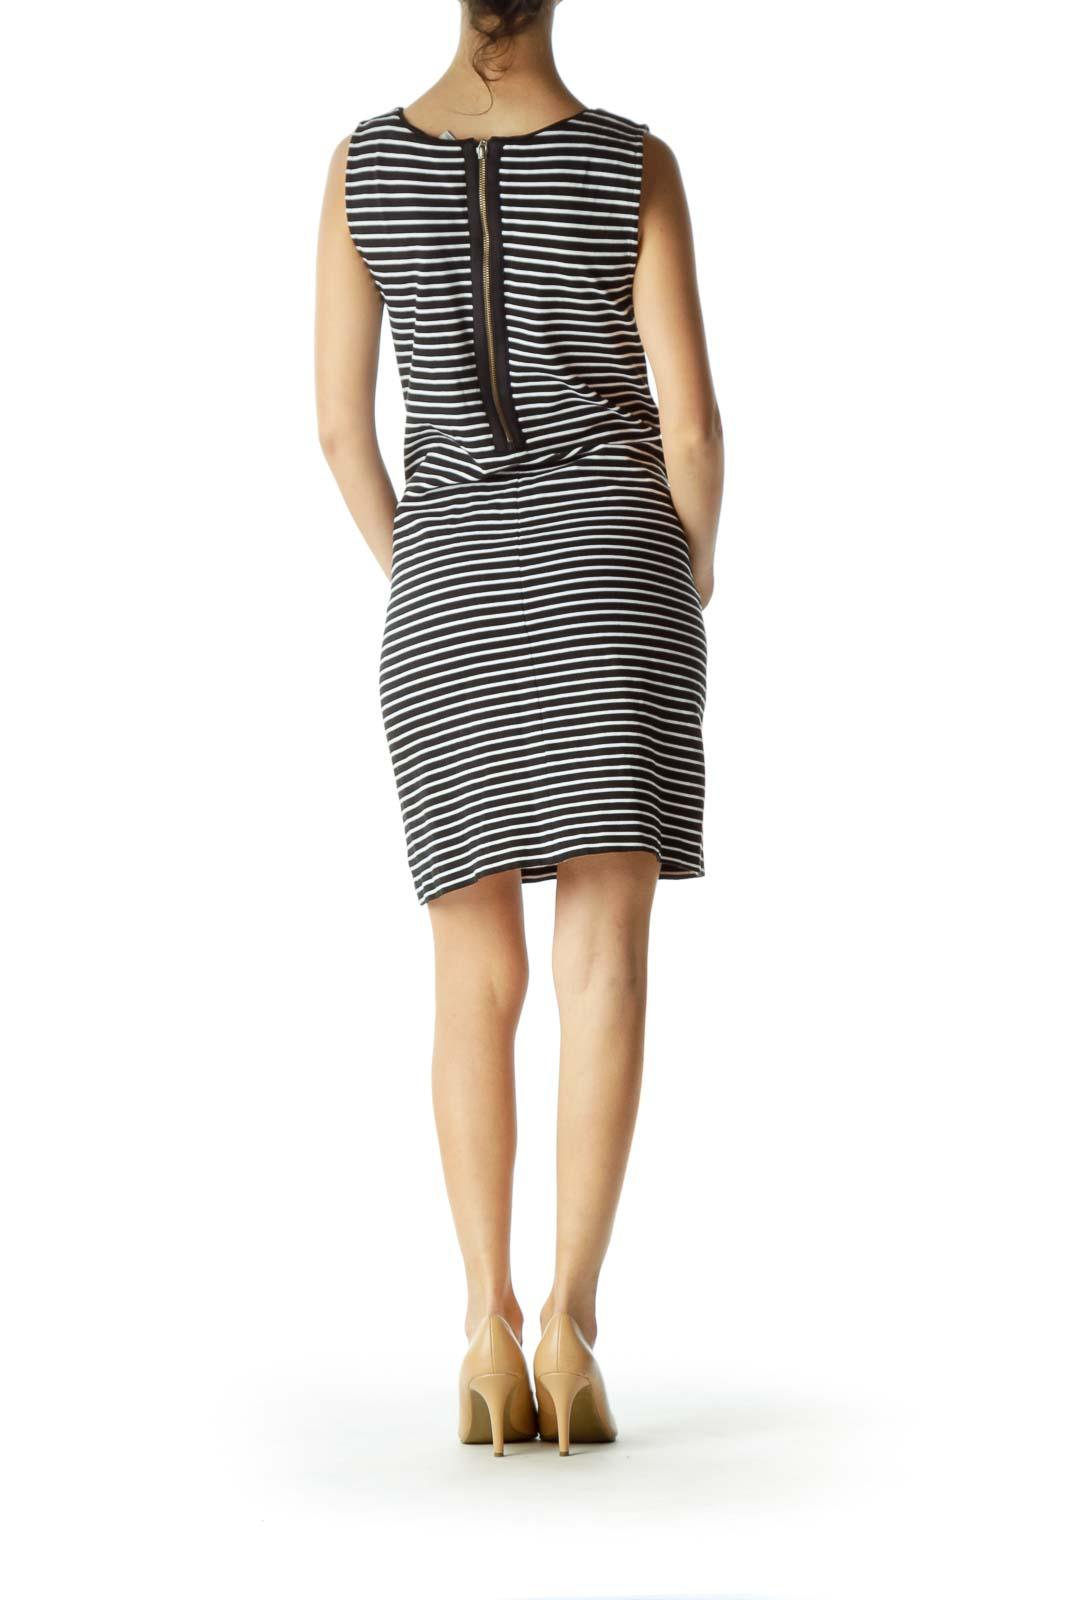 Navy Striped Pocketed Knit Dress